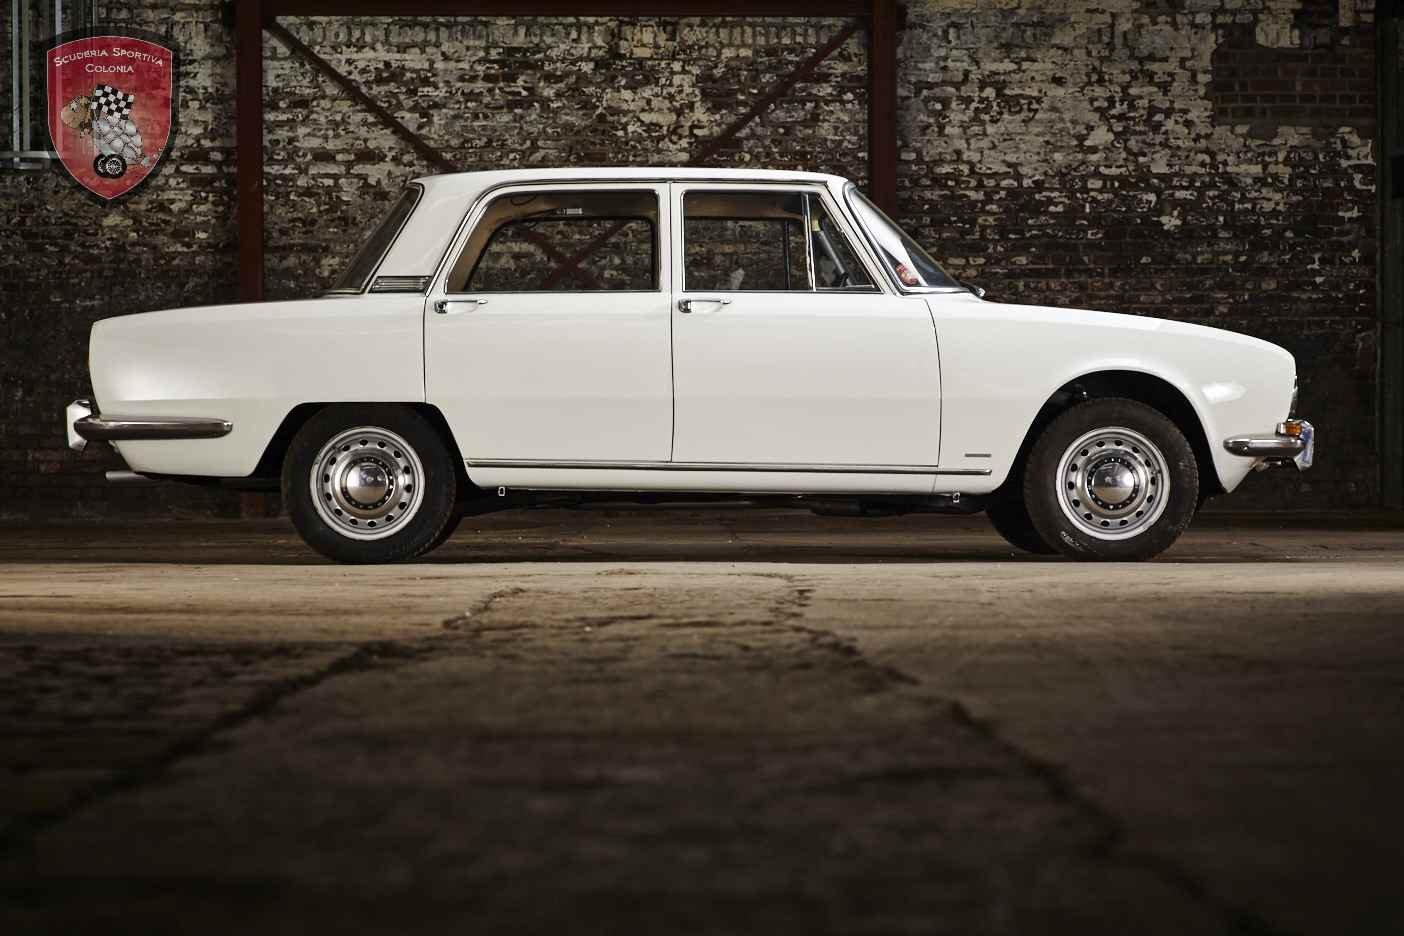 1968 Alfa Romeo 1750 Berlina  For Sale (picture 2 of 6)